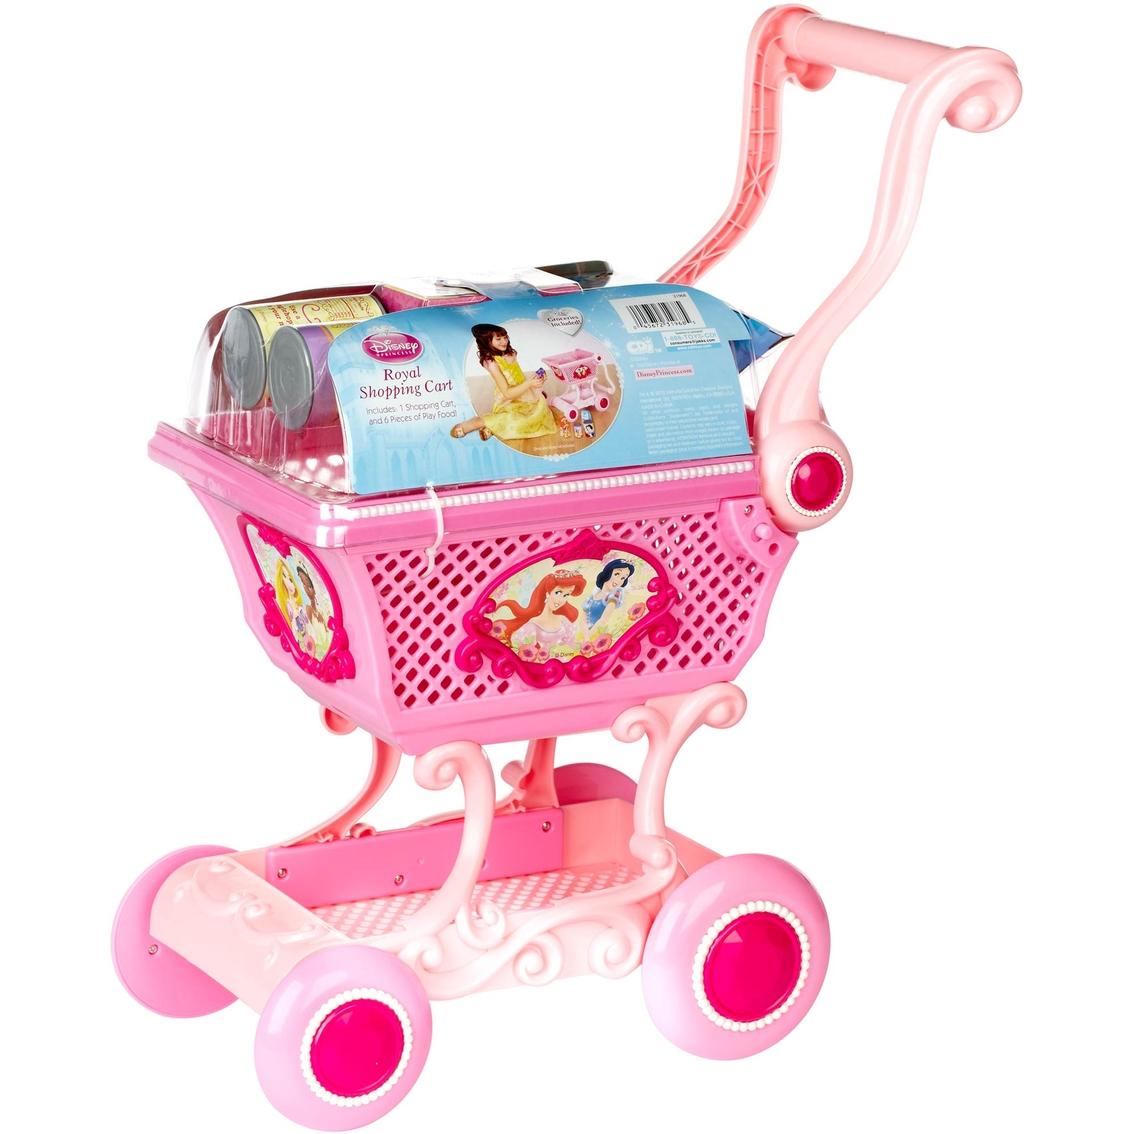 Disney Princess Shopping Cart   Toys   Shop The Exchange